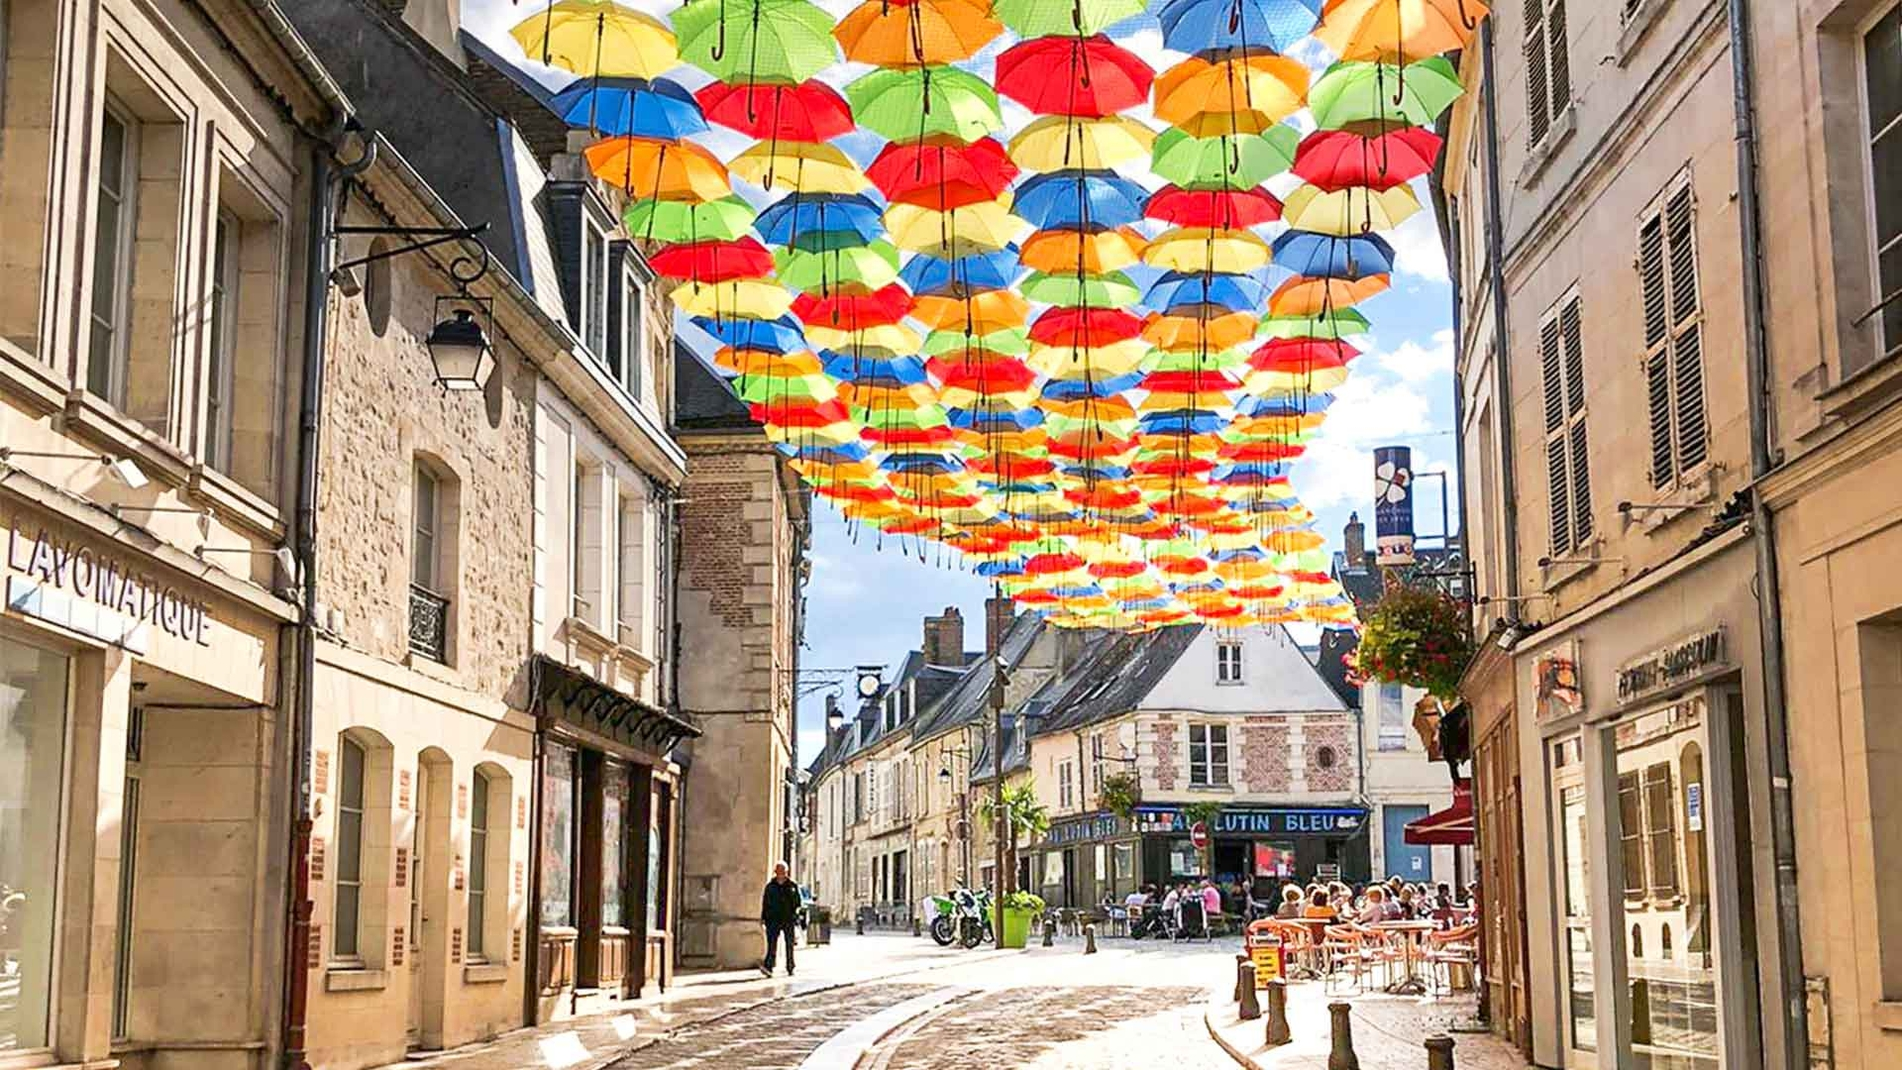 Umbrella Sky Project e Shiny Rain - Laon'20